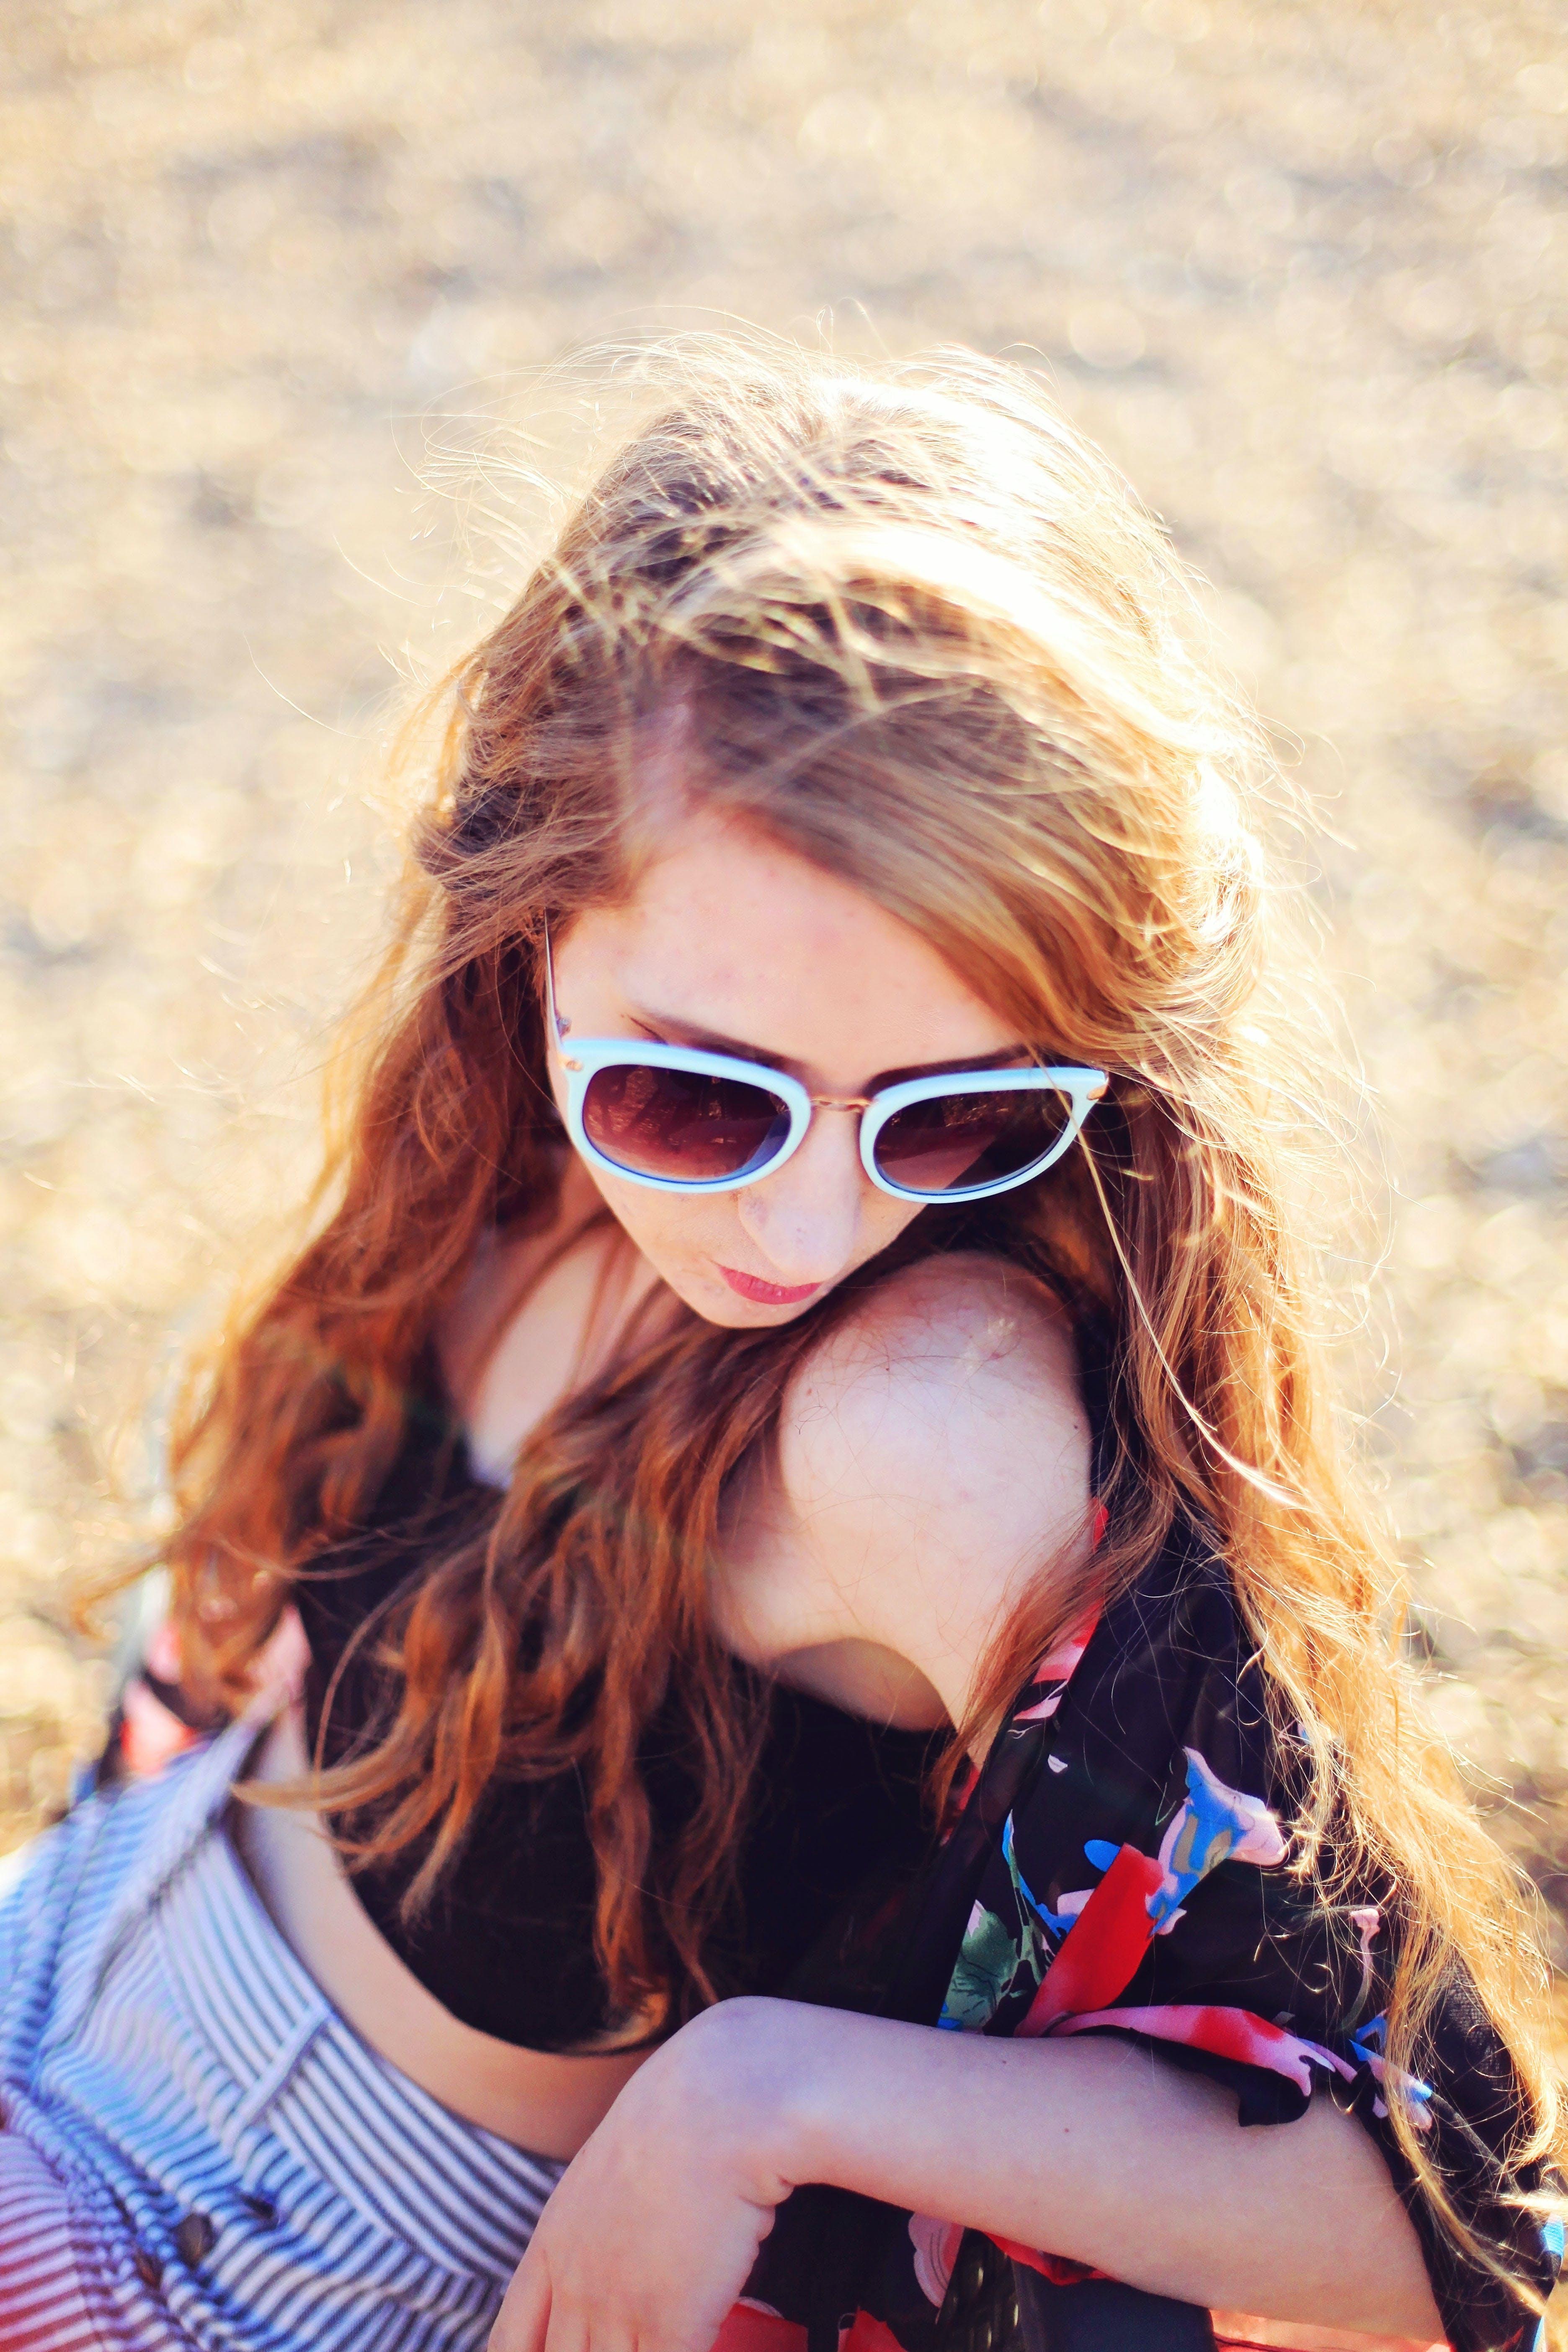 Woman Sitting on Sand Wearing White Sunglasses